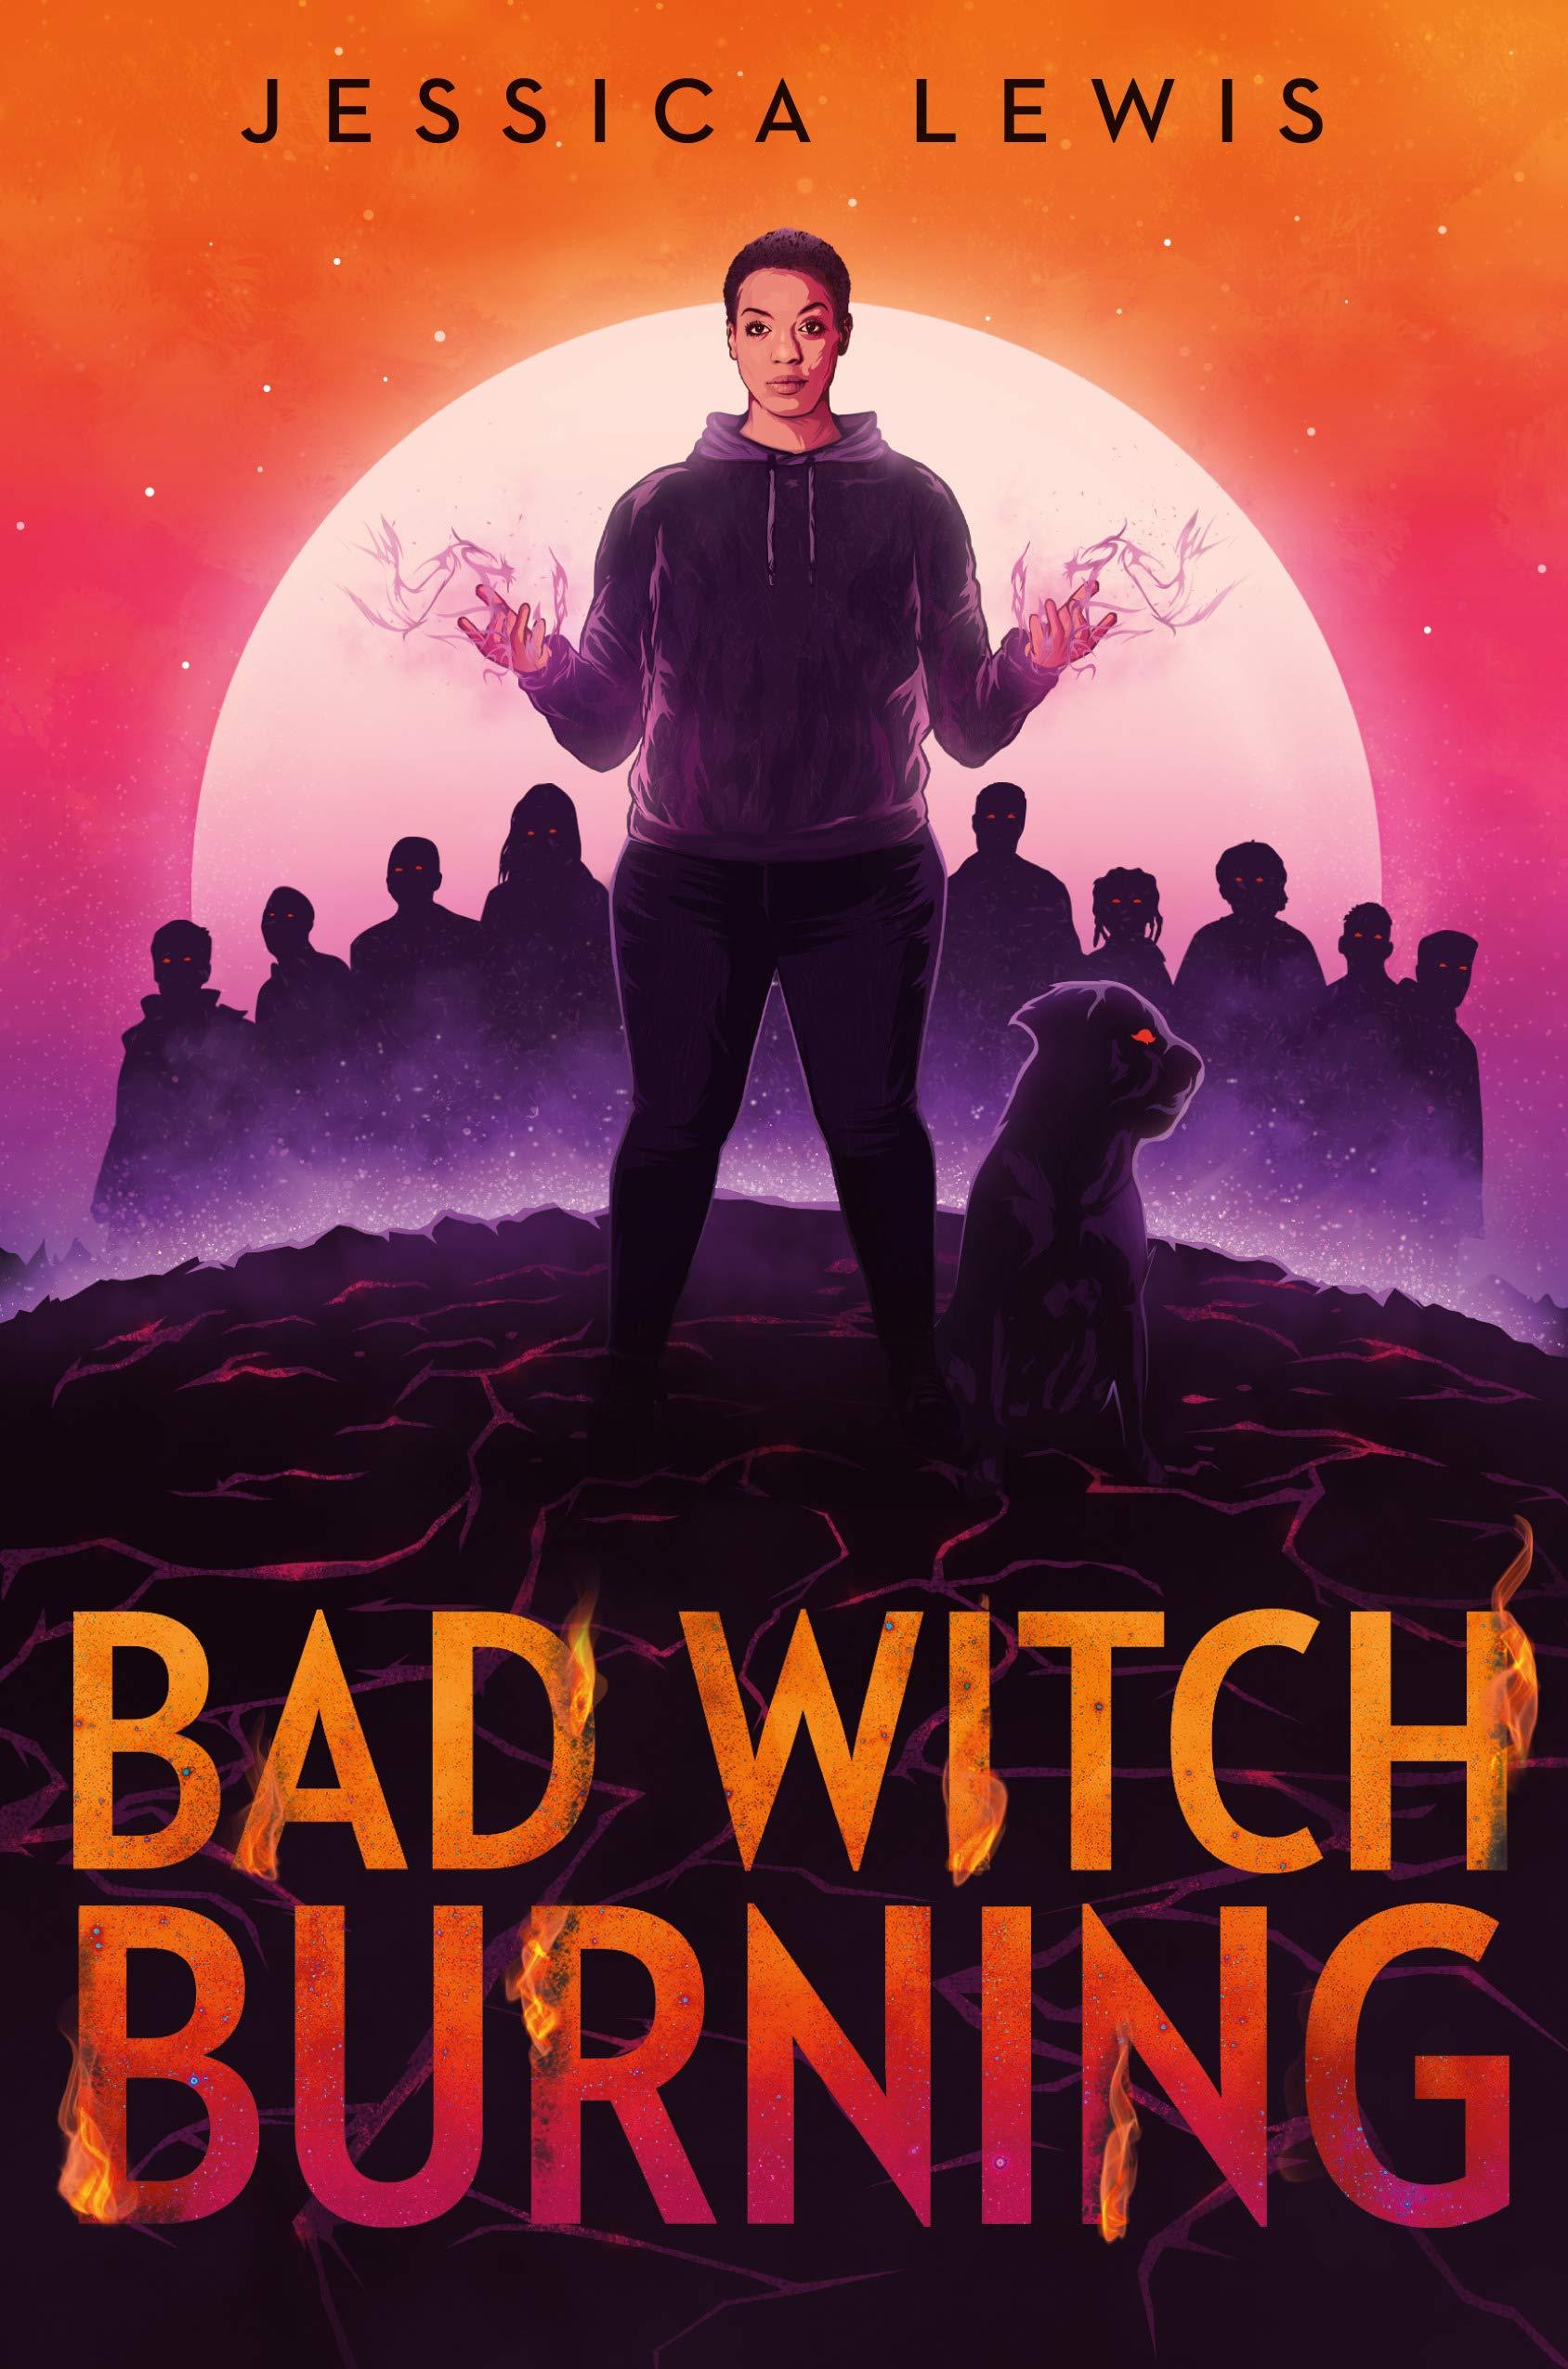 Amazon.com: Bad Witch Burning (9780593177402): Lewis, Jessica: Books